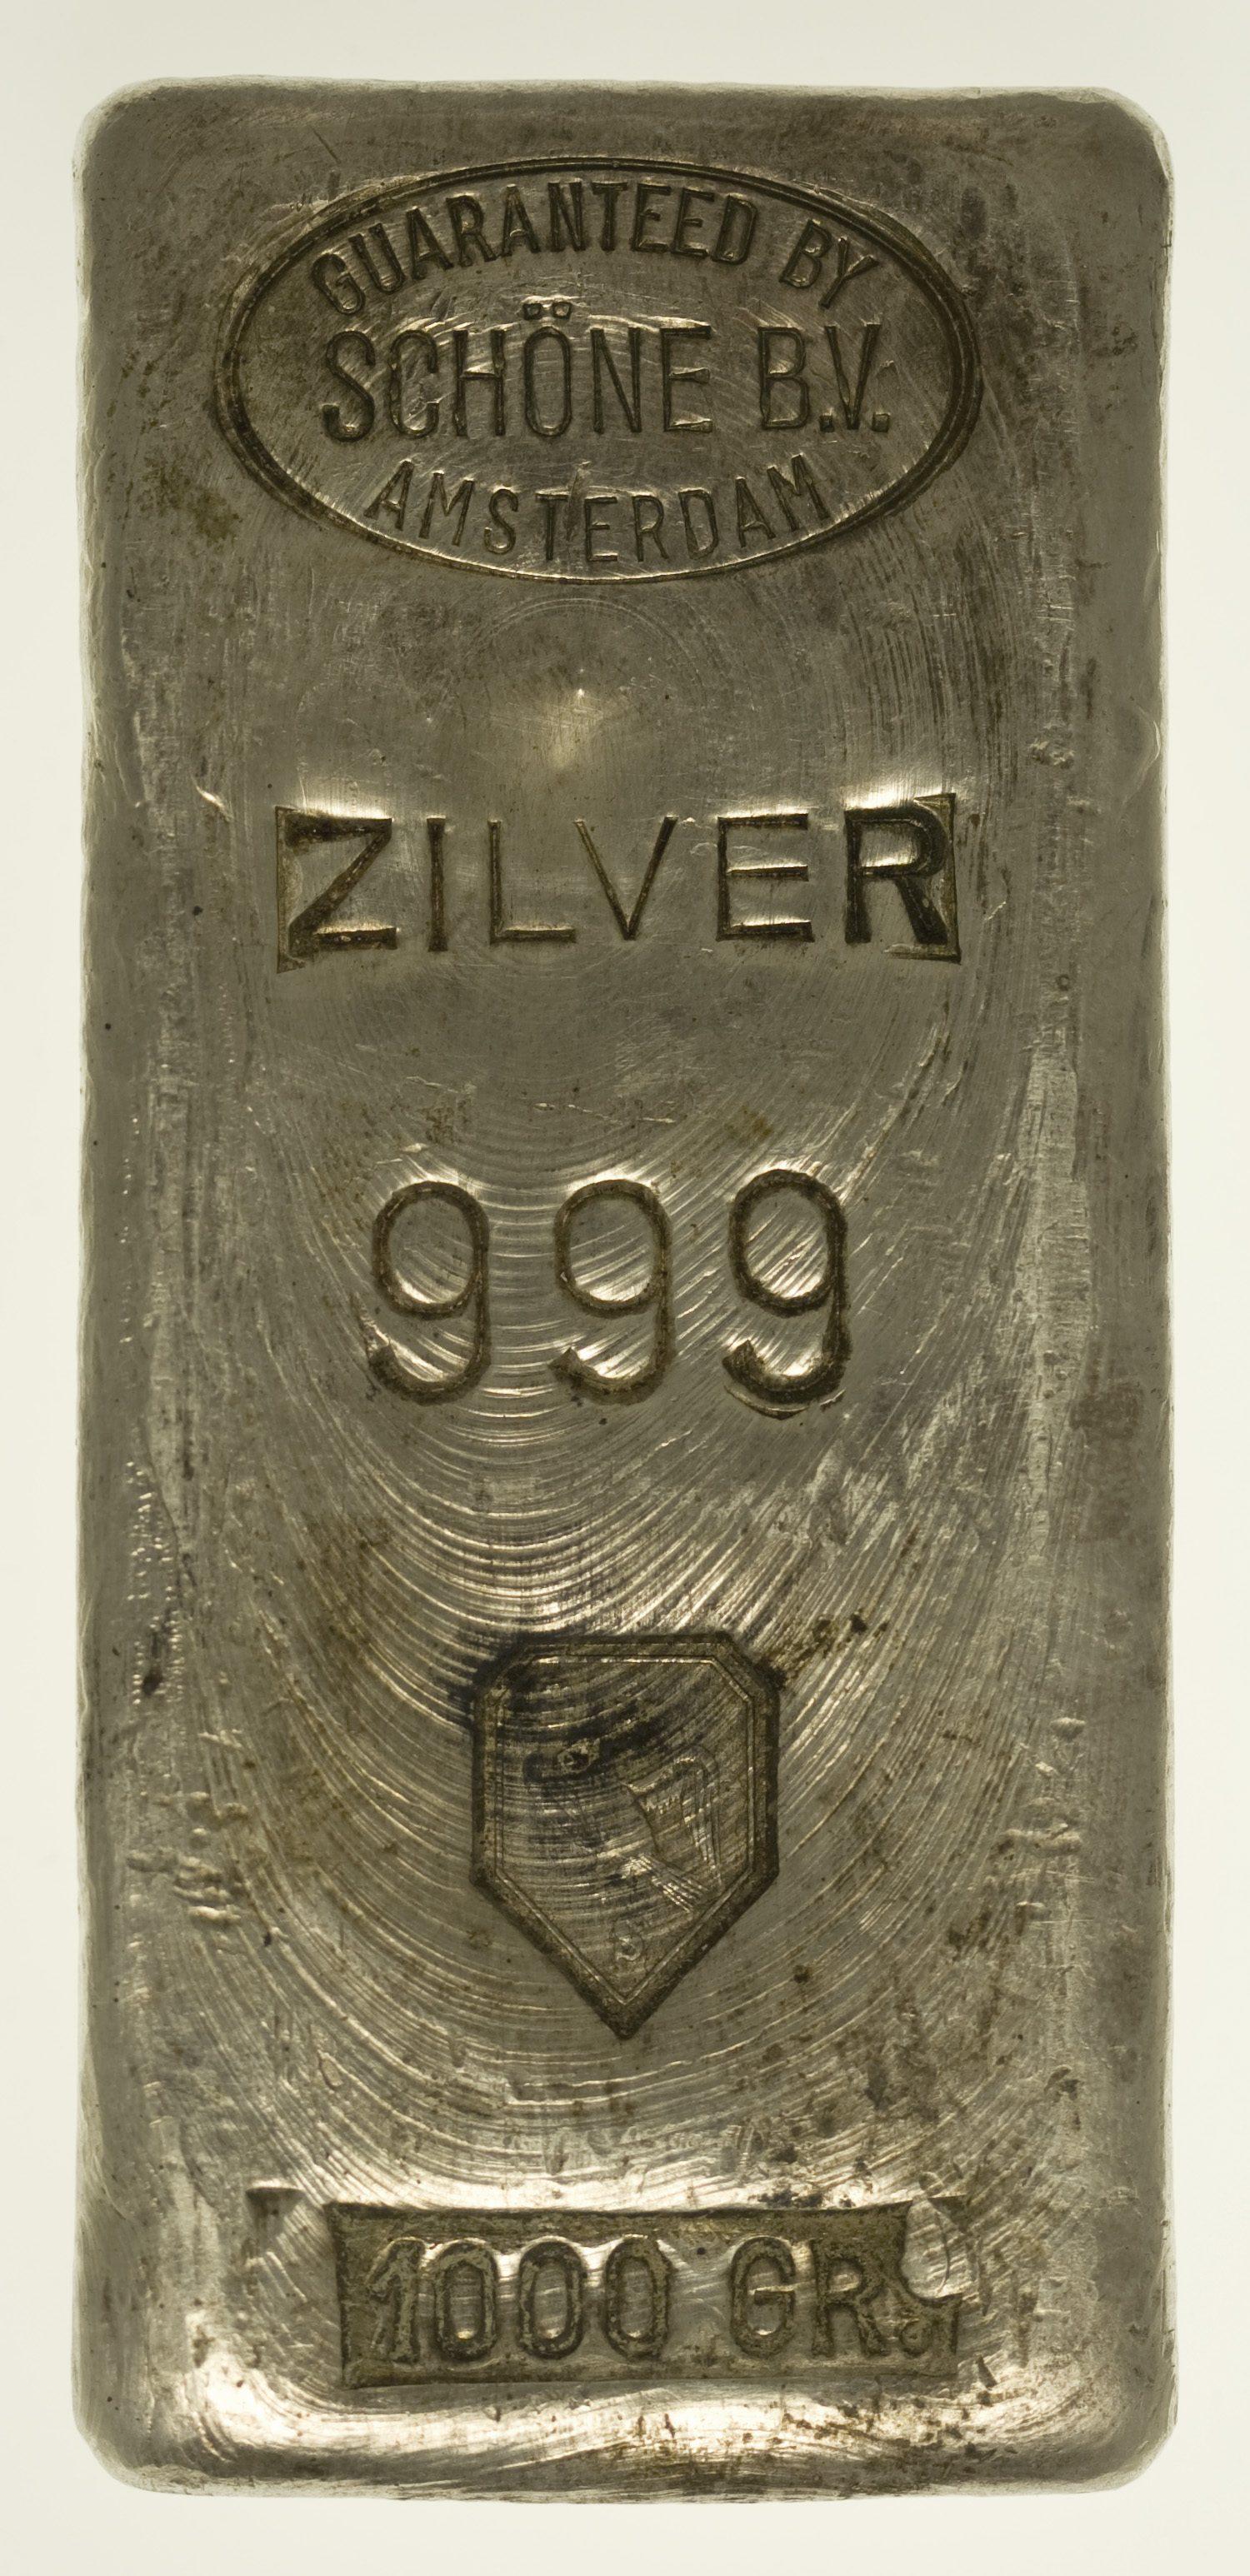 silberbarren - Silberbarren 1 Kilogramm Schöne B.V.